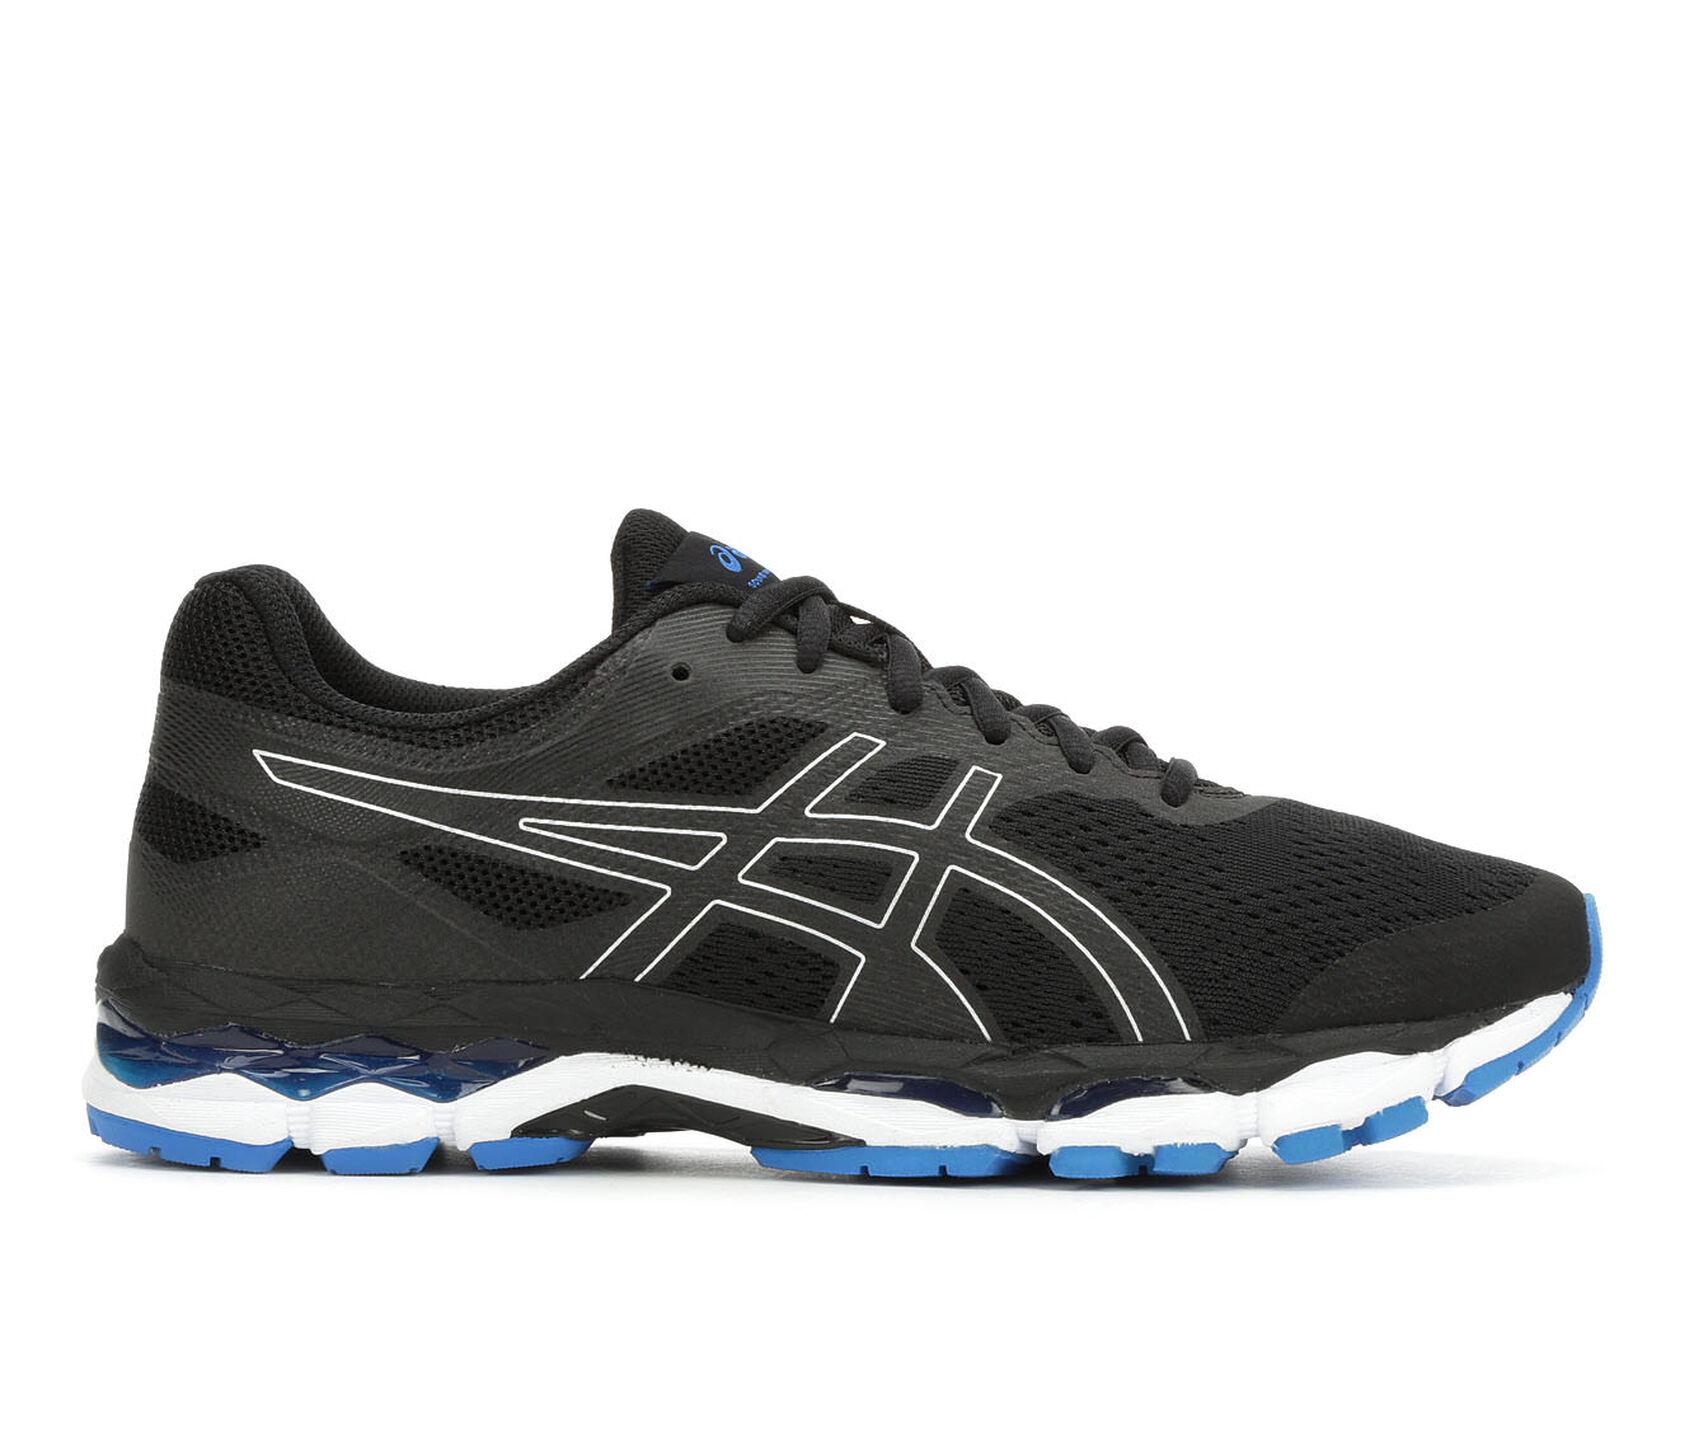 acca7d666f6 Men s ASICS Gel Superion 2 Running Shoes